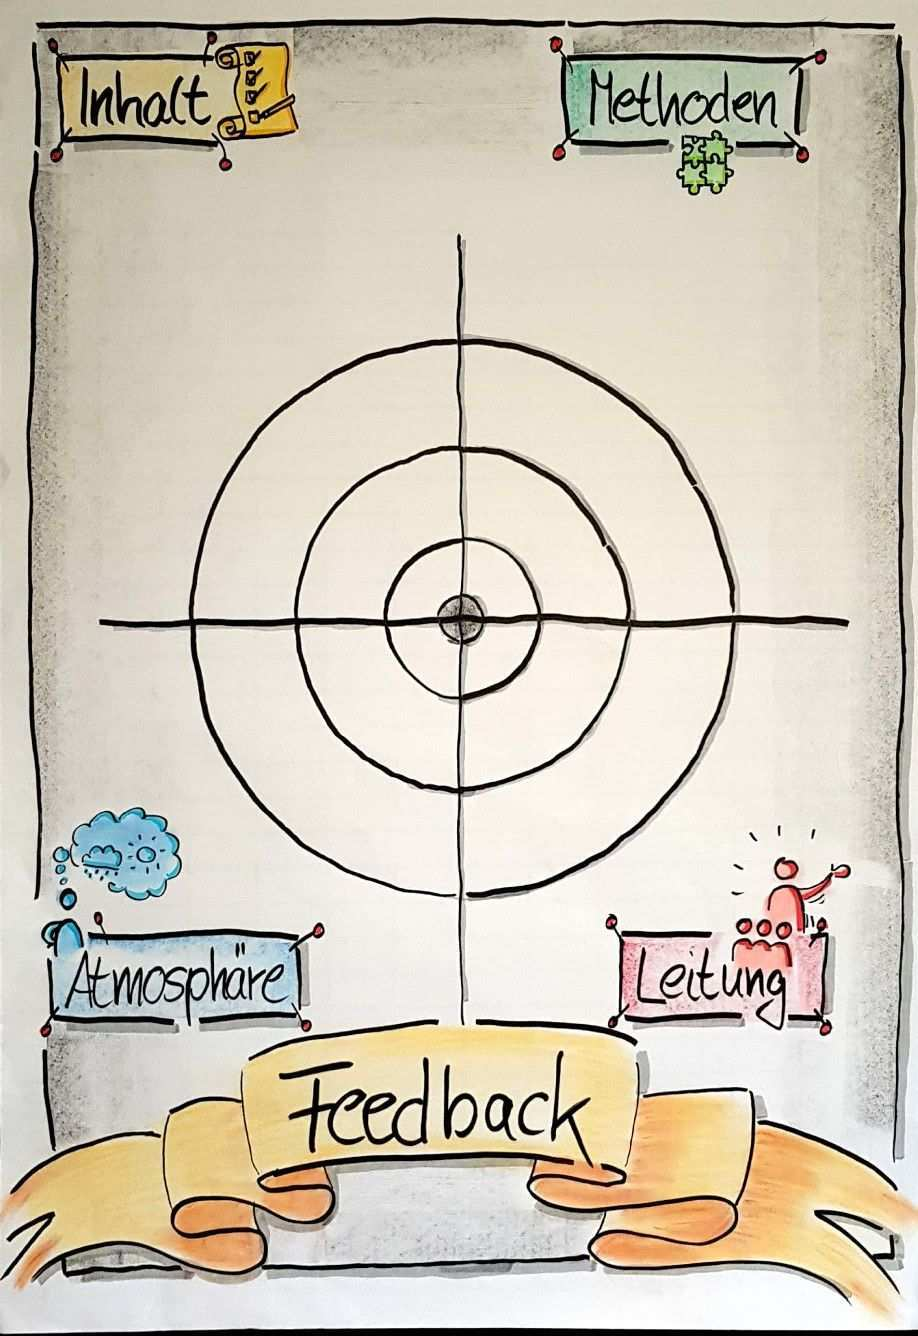 Flipchart Feedback Methode Method Seminar Training Schule Flipchart Gestalten Flipcharts Flipchart